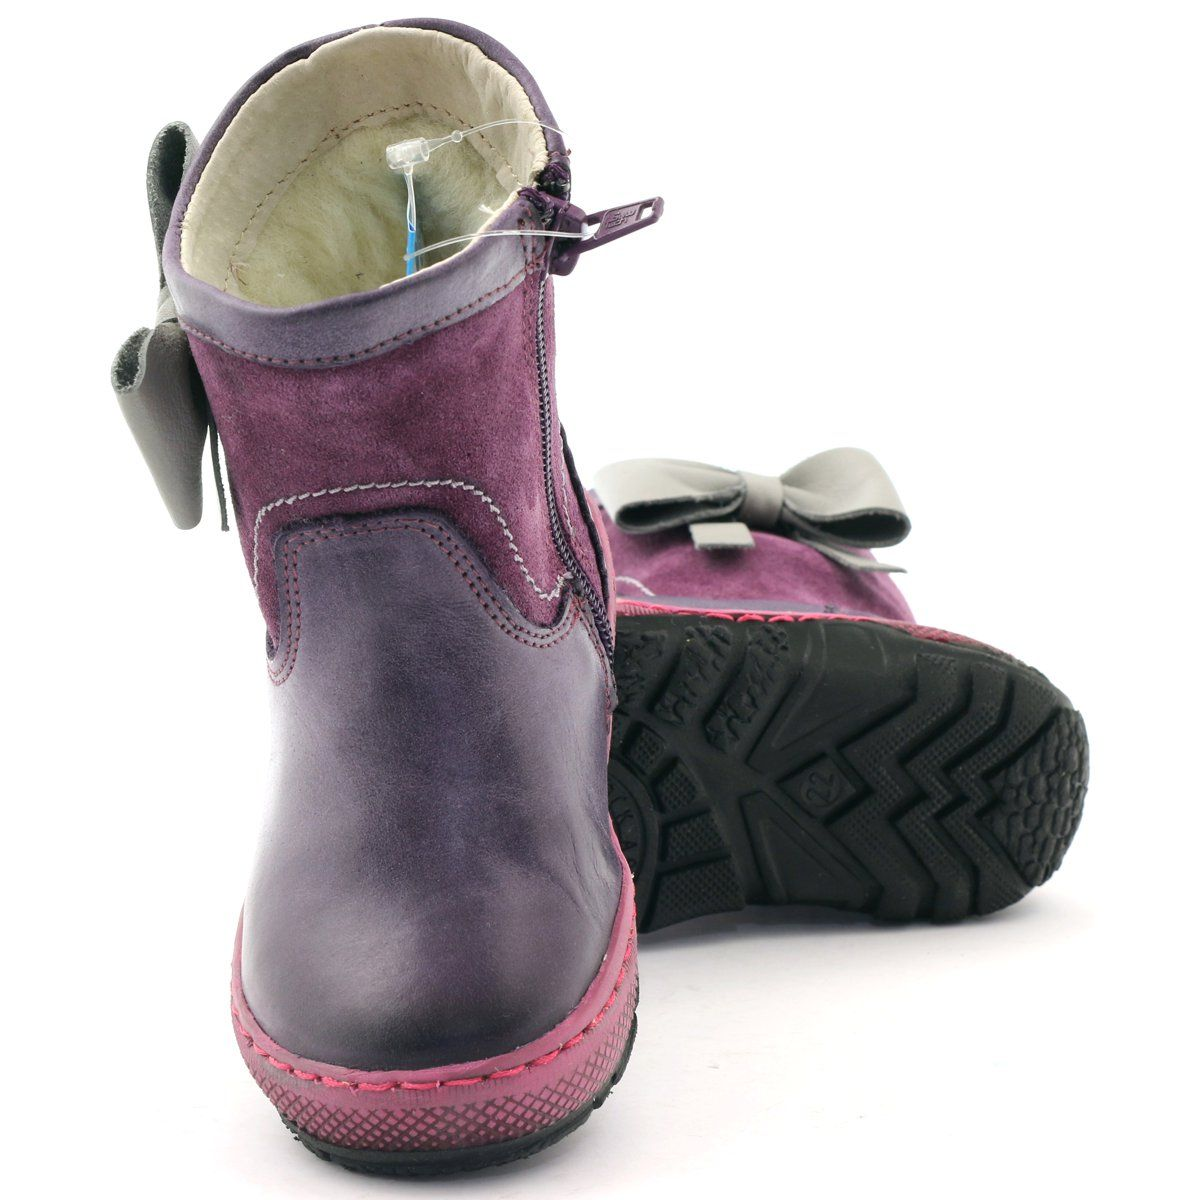 Kozaczki Dziewczece Kokarda Ren But 1458 Szare Fioletowe Boots Rubber Rain Boots Rain Boots